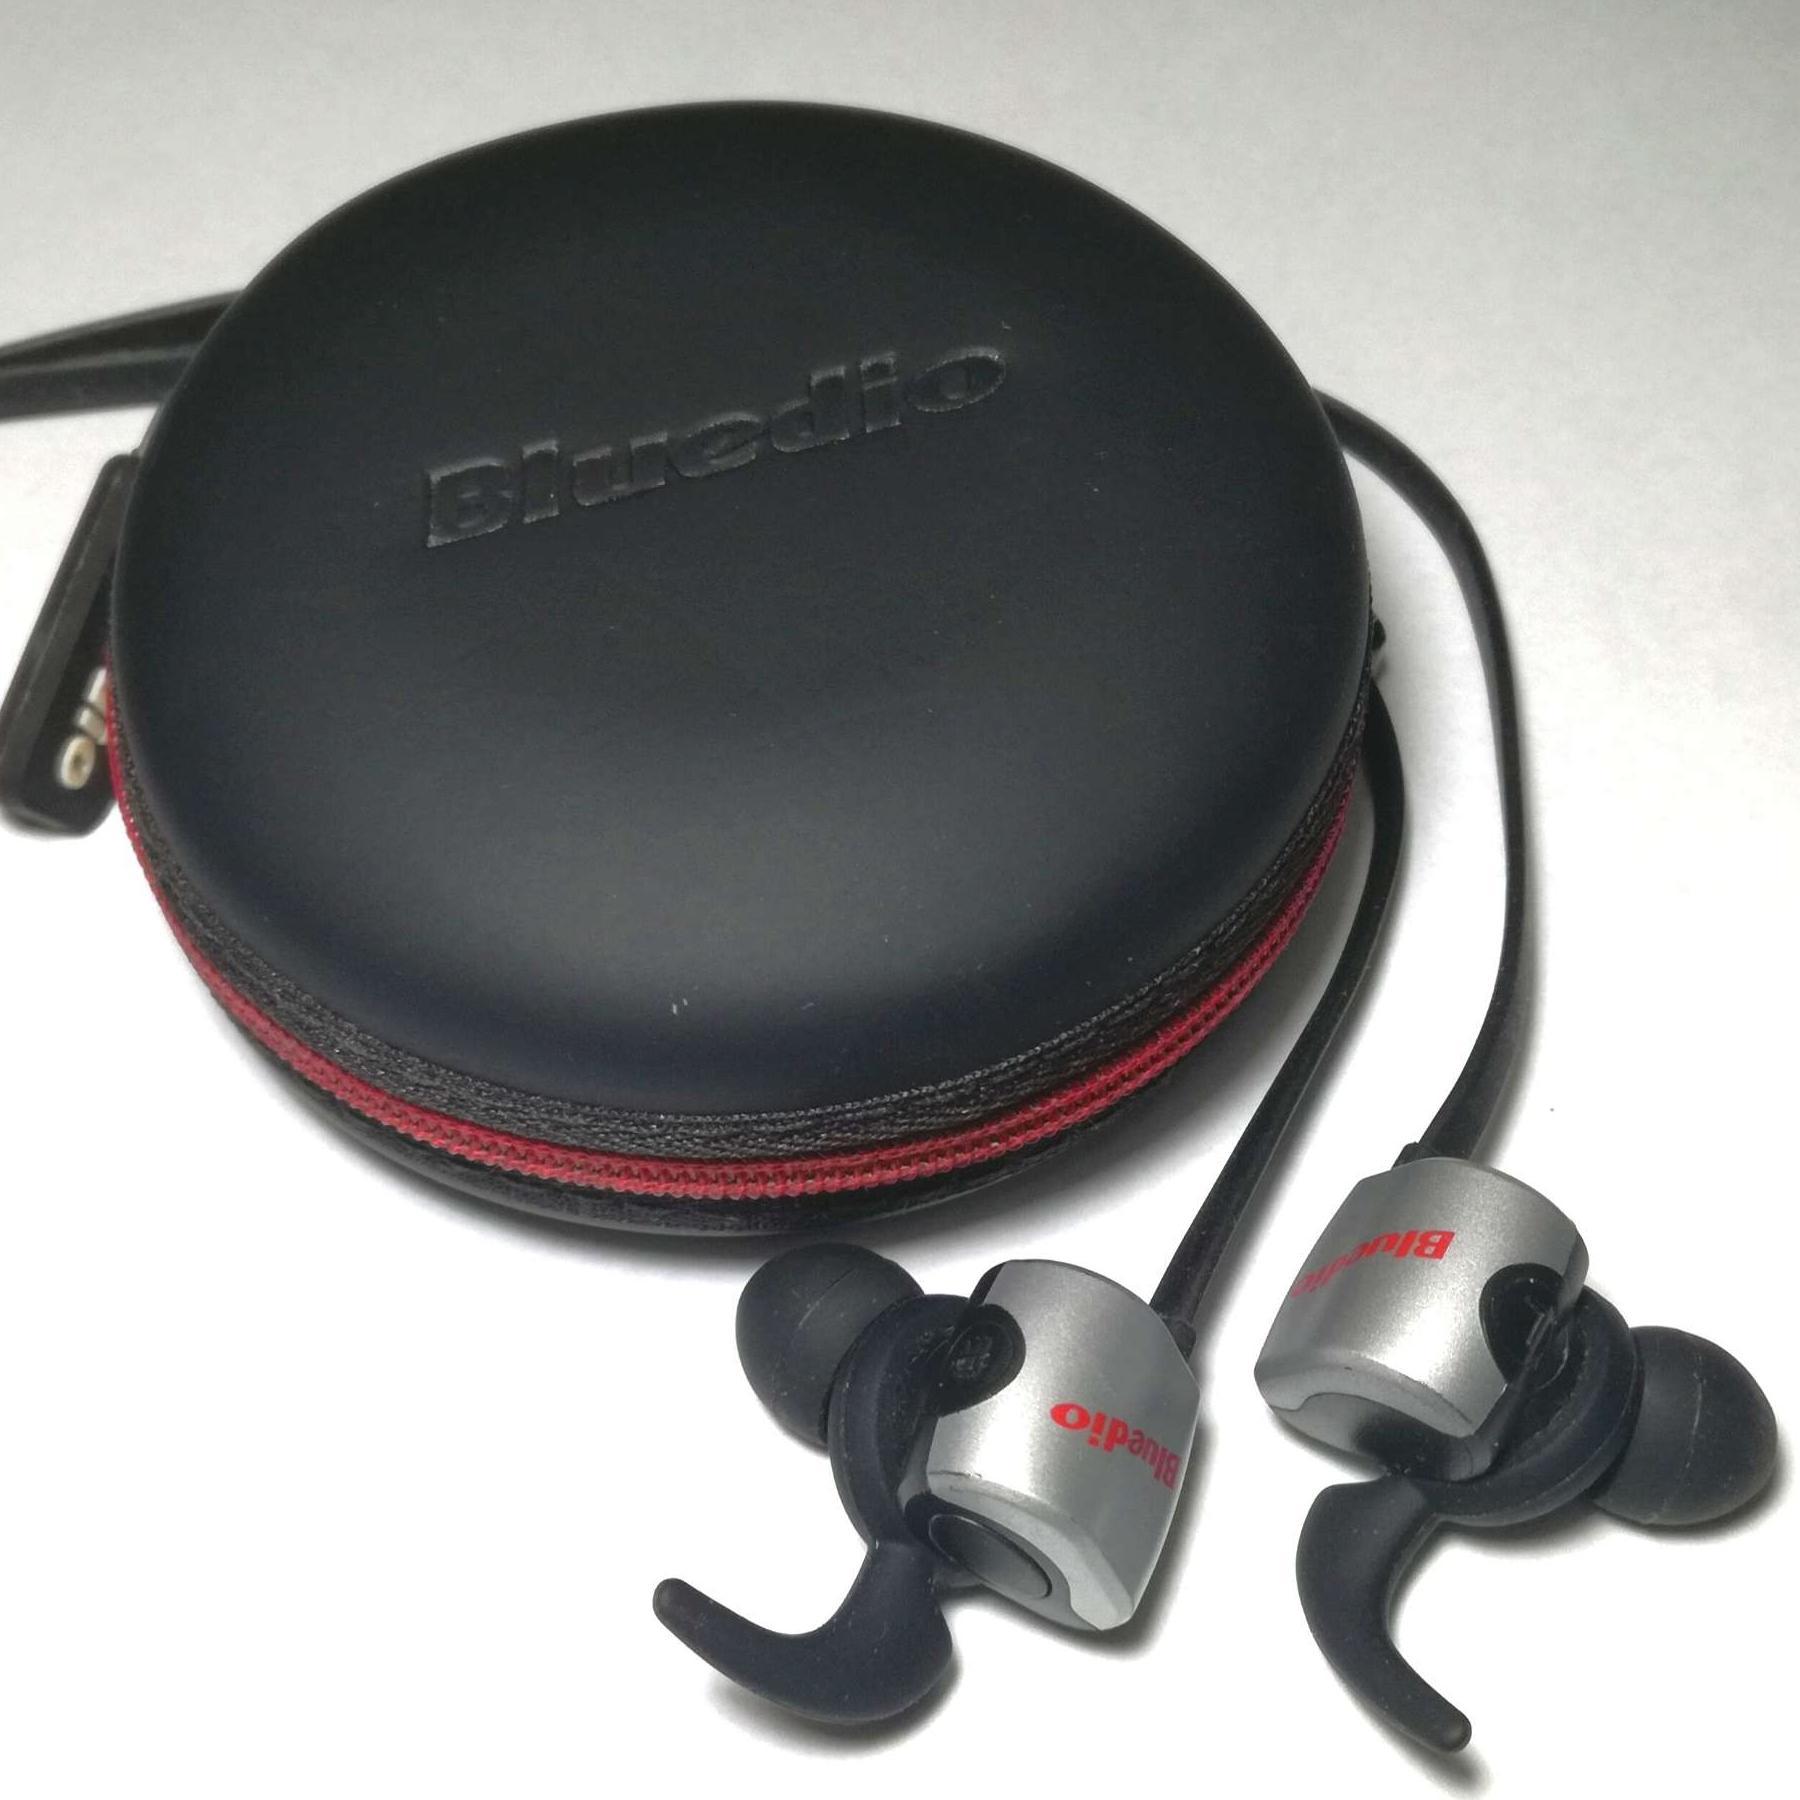 Buy Sell Cheapest Bluedio Tm Best Quality Product Deals Cck Ks Original Bluetooth 41 Wireless Headphones Te